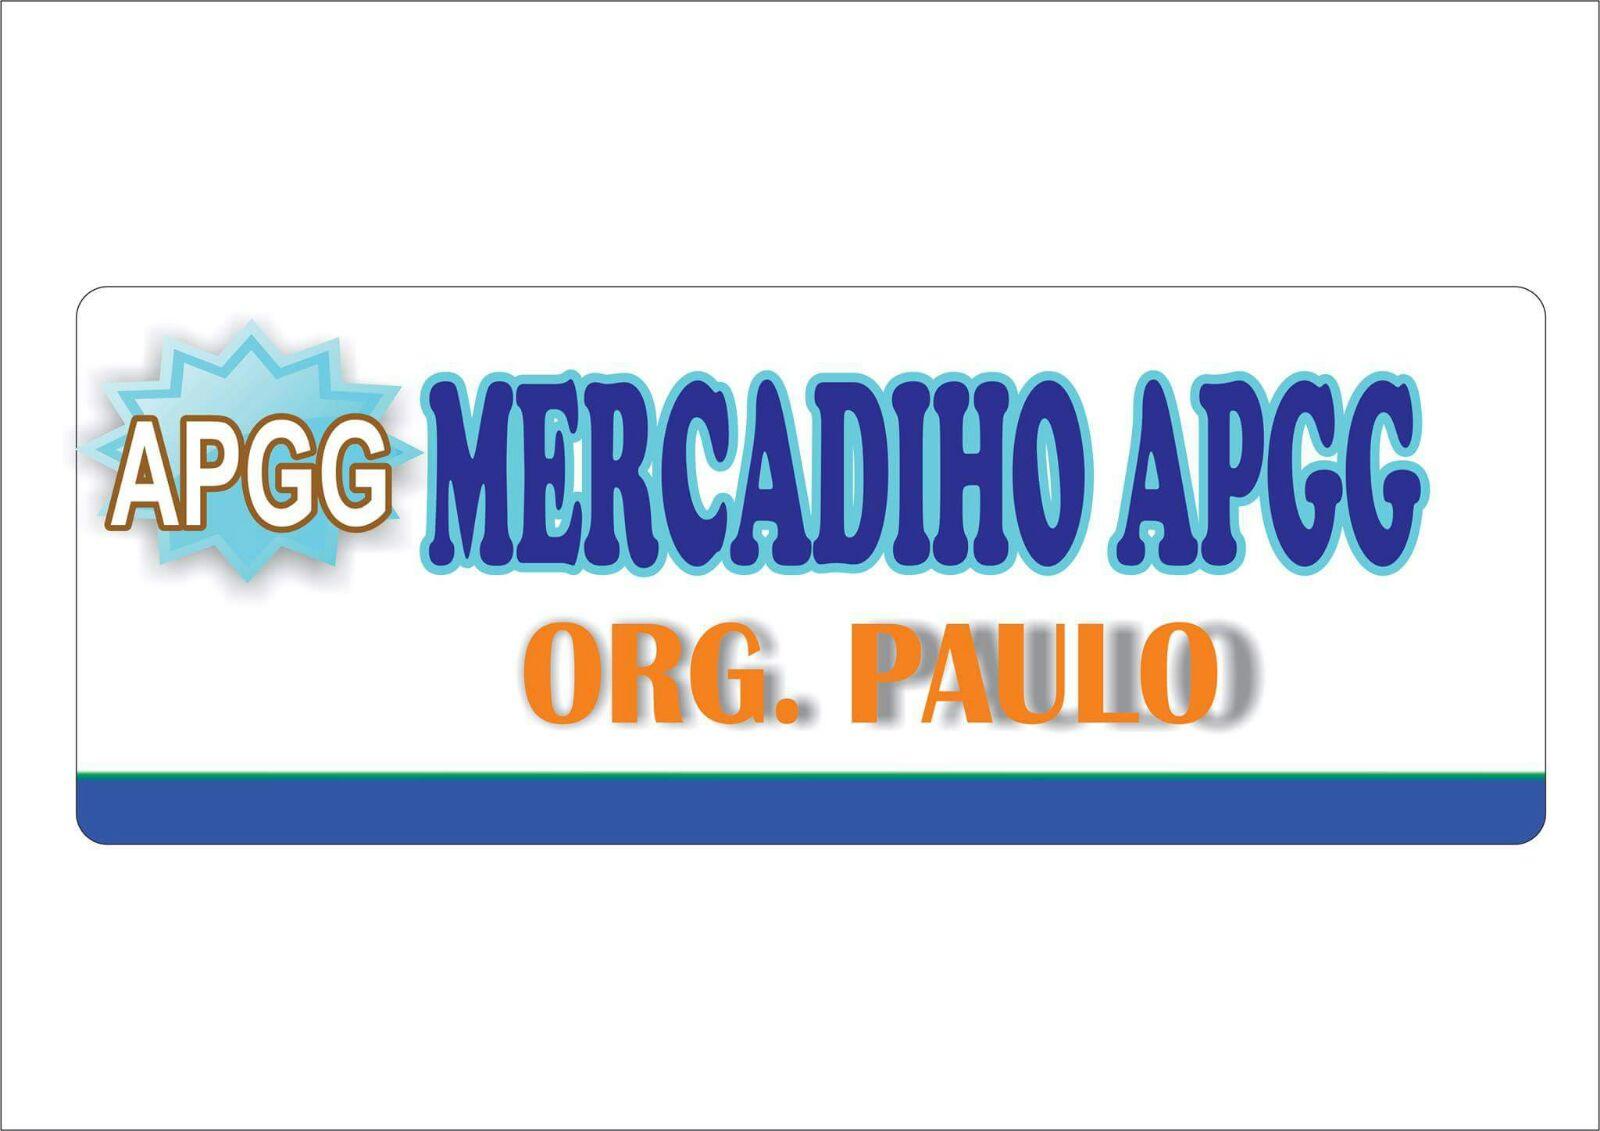 MERCADINHO APGG